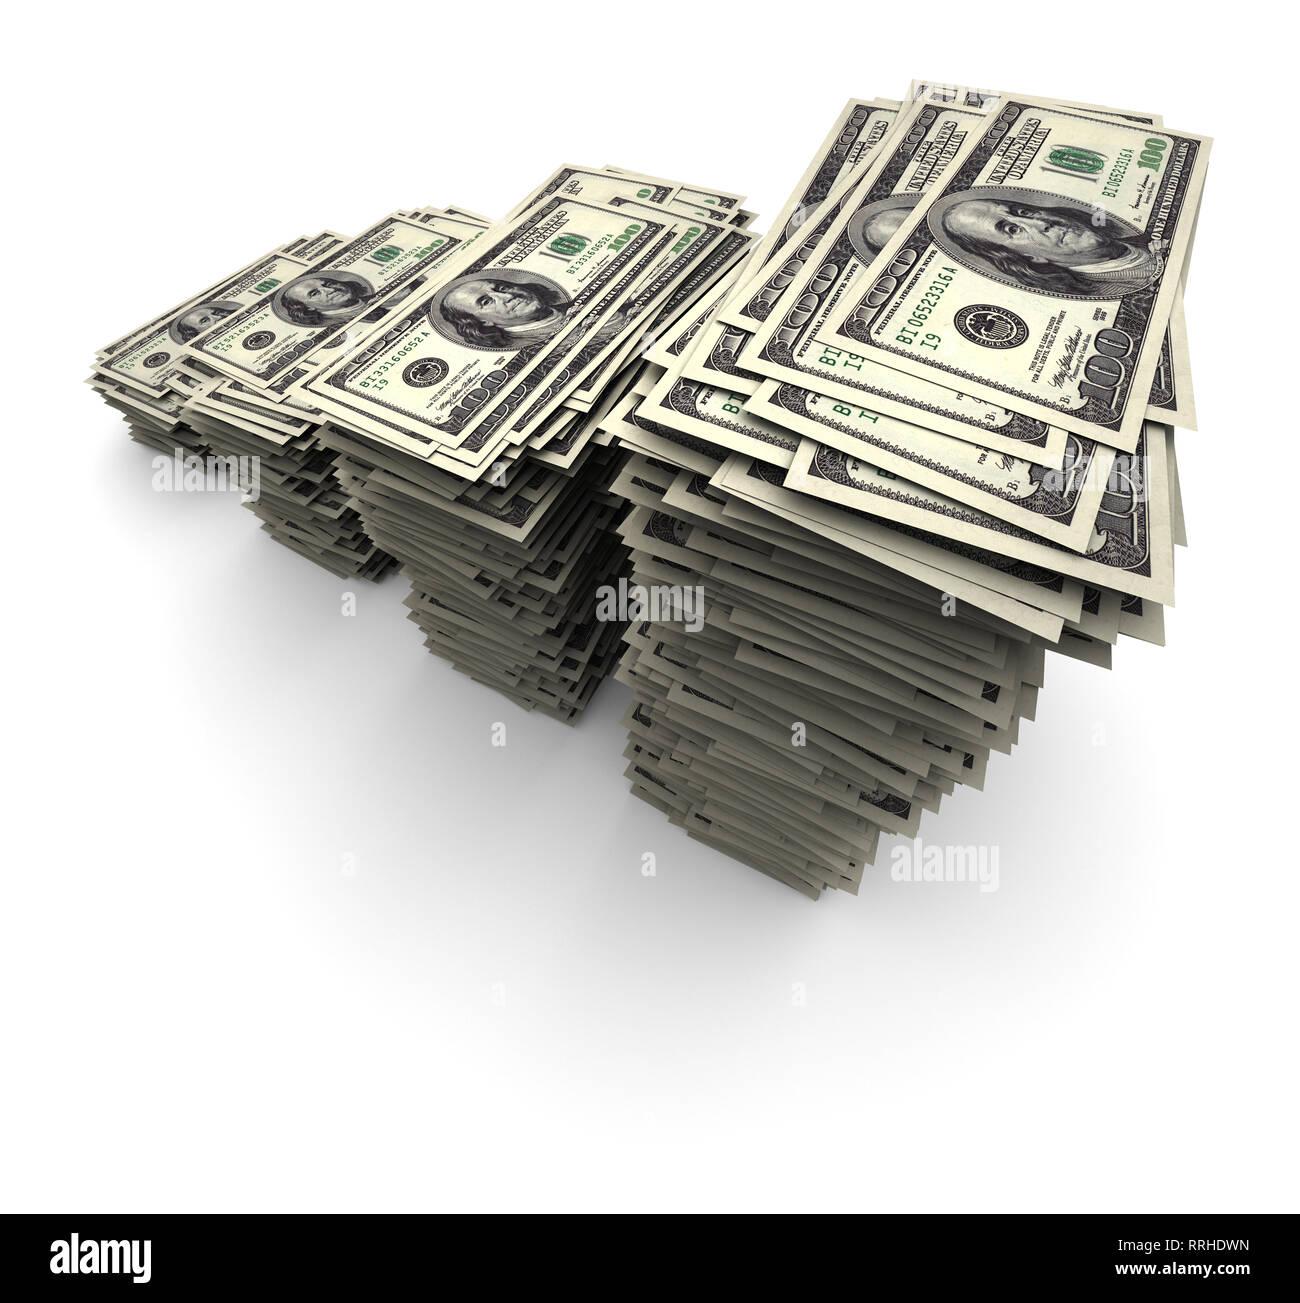 Super high resolution 3D render of one thousand $100 US dollar bills. - Stock Image